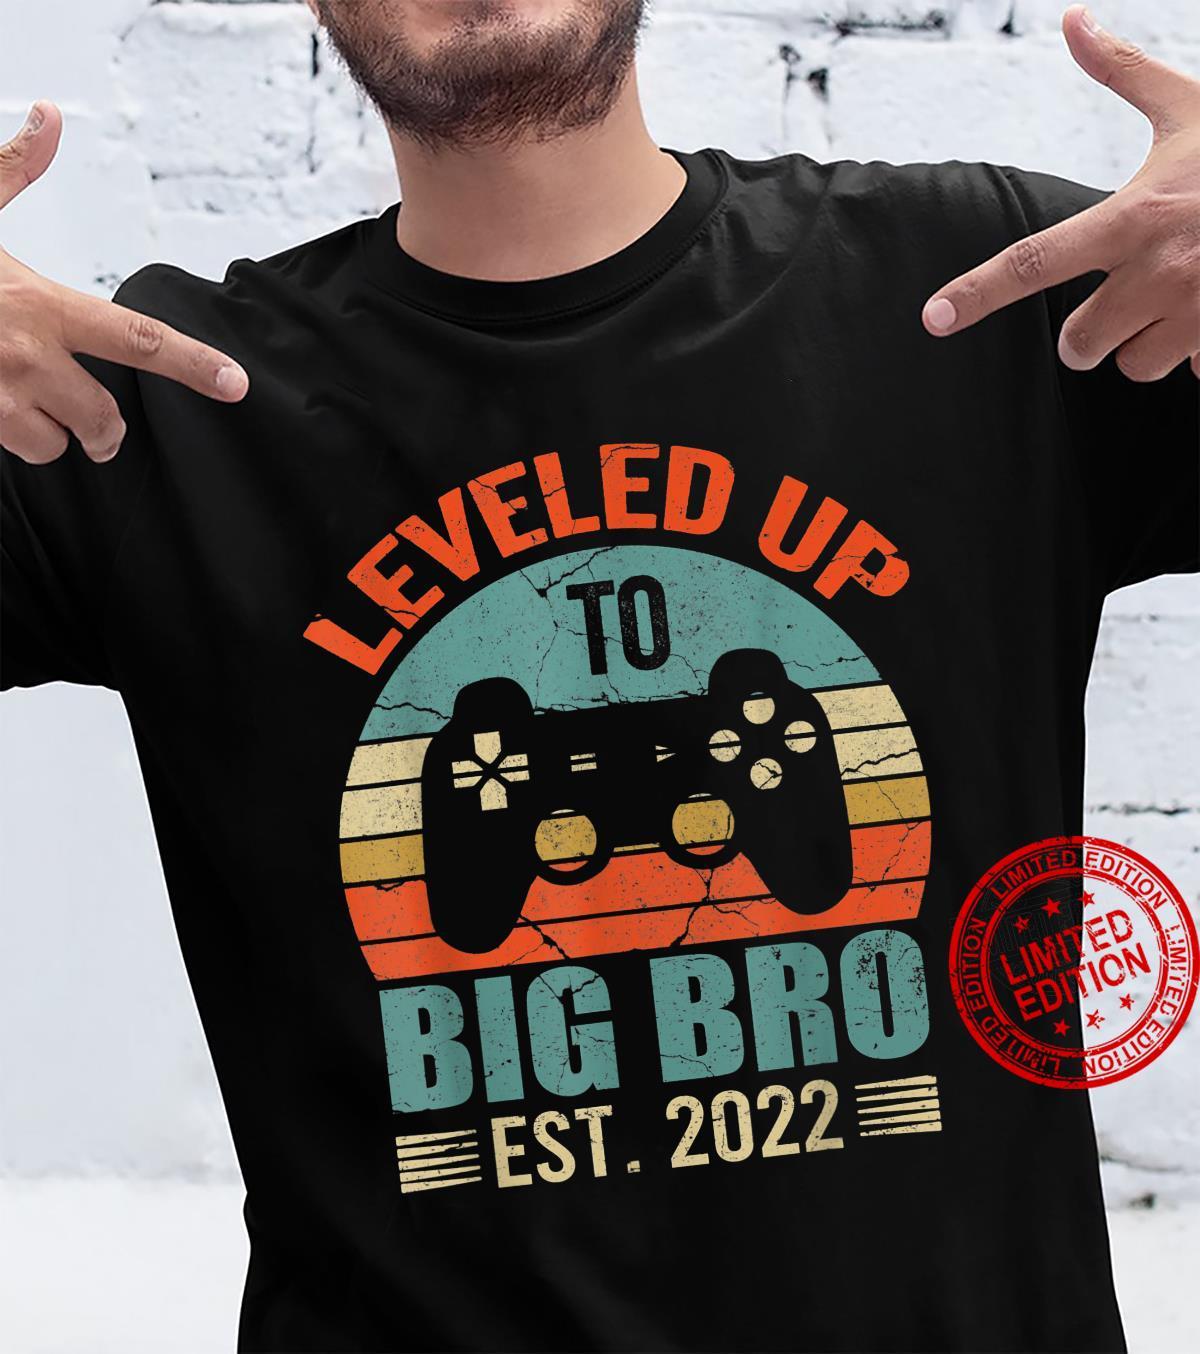 Big Brother EST 2022 Shirt, Leveled Up To Big Brother 2022 Shirt